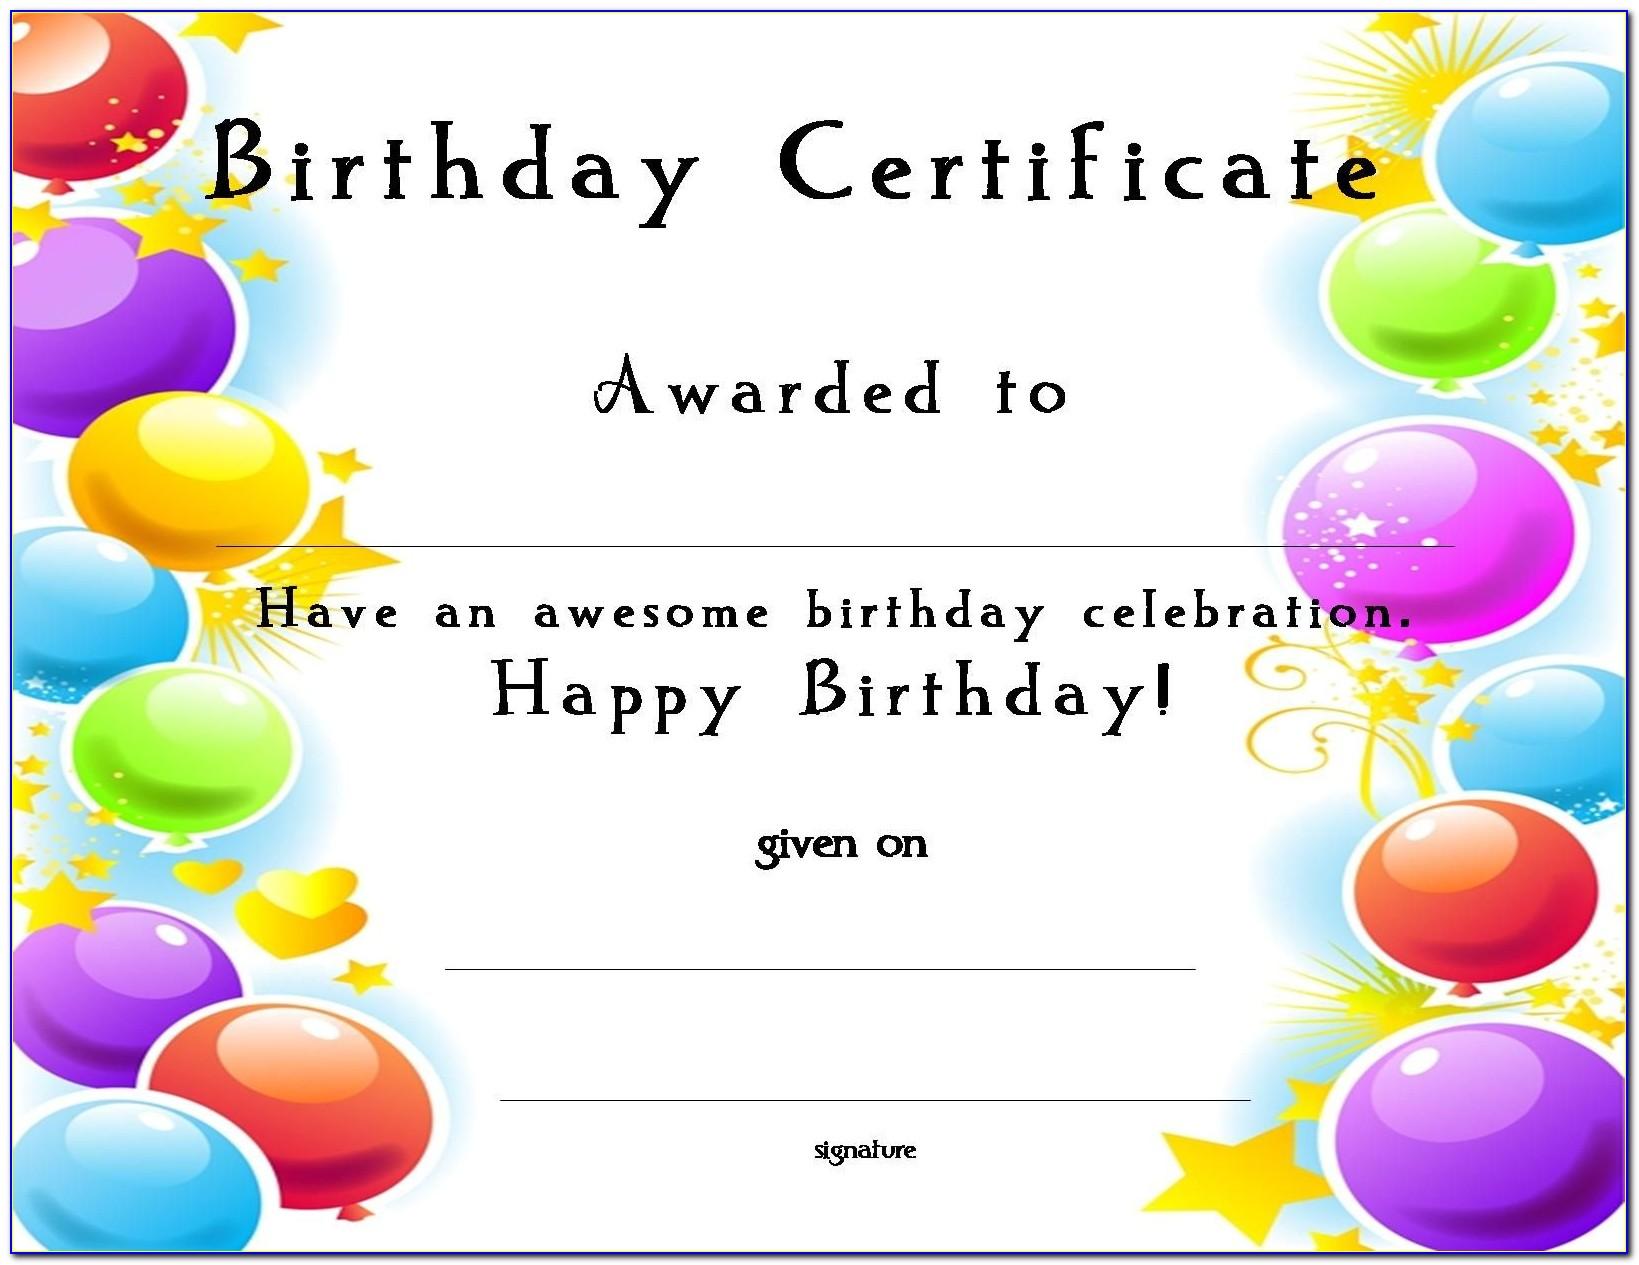 Birthday Certificate Template Free